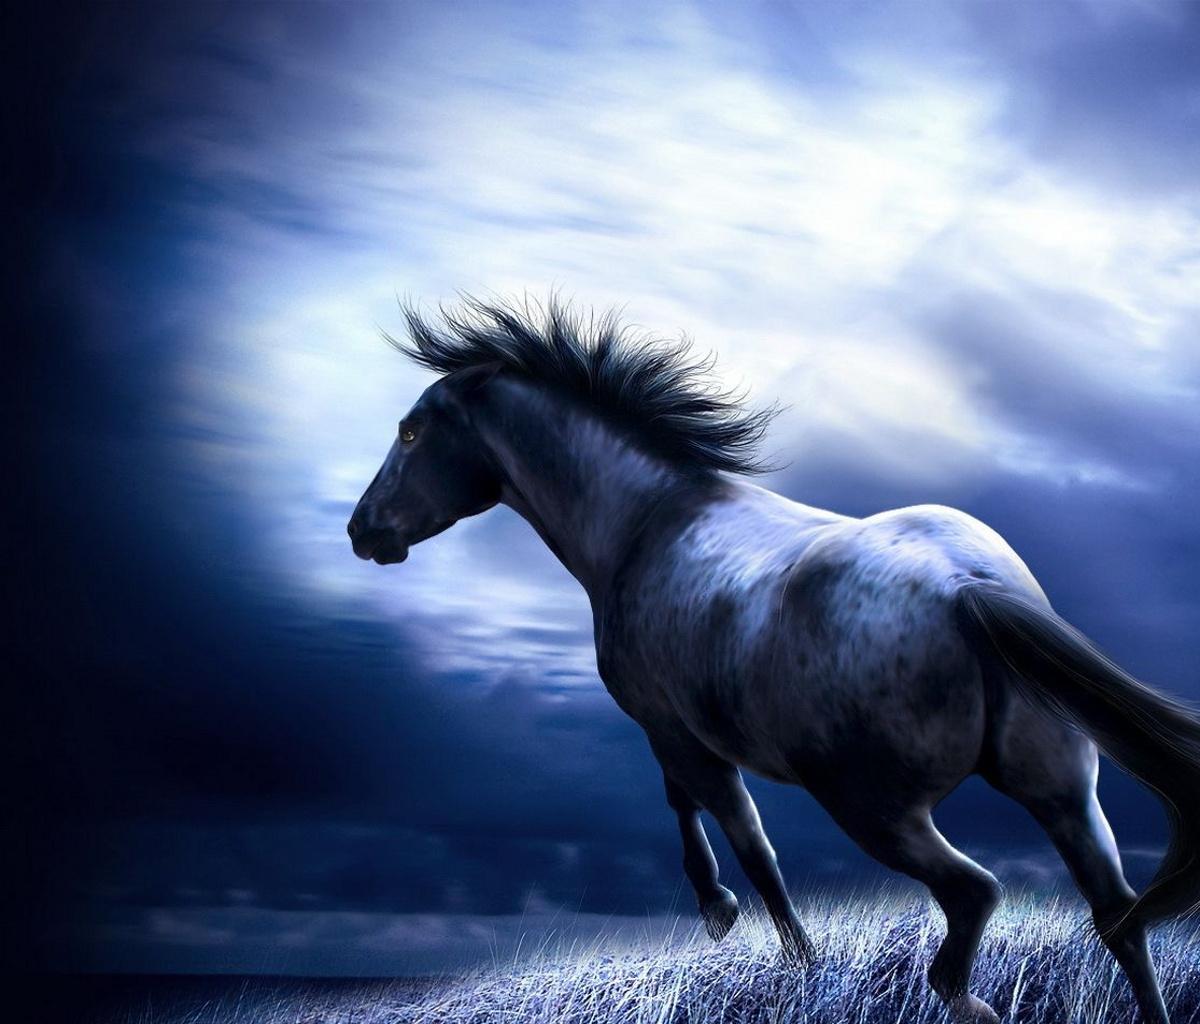 50 Free Horse Wallpapers And Screensavers On Wallpapersafari